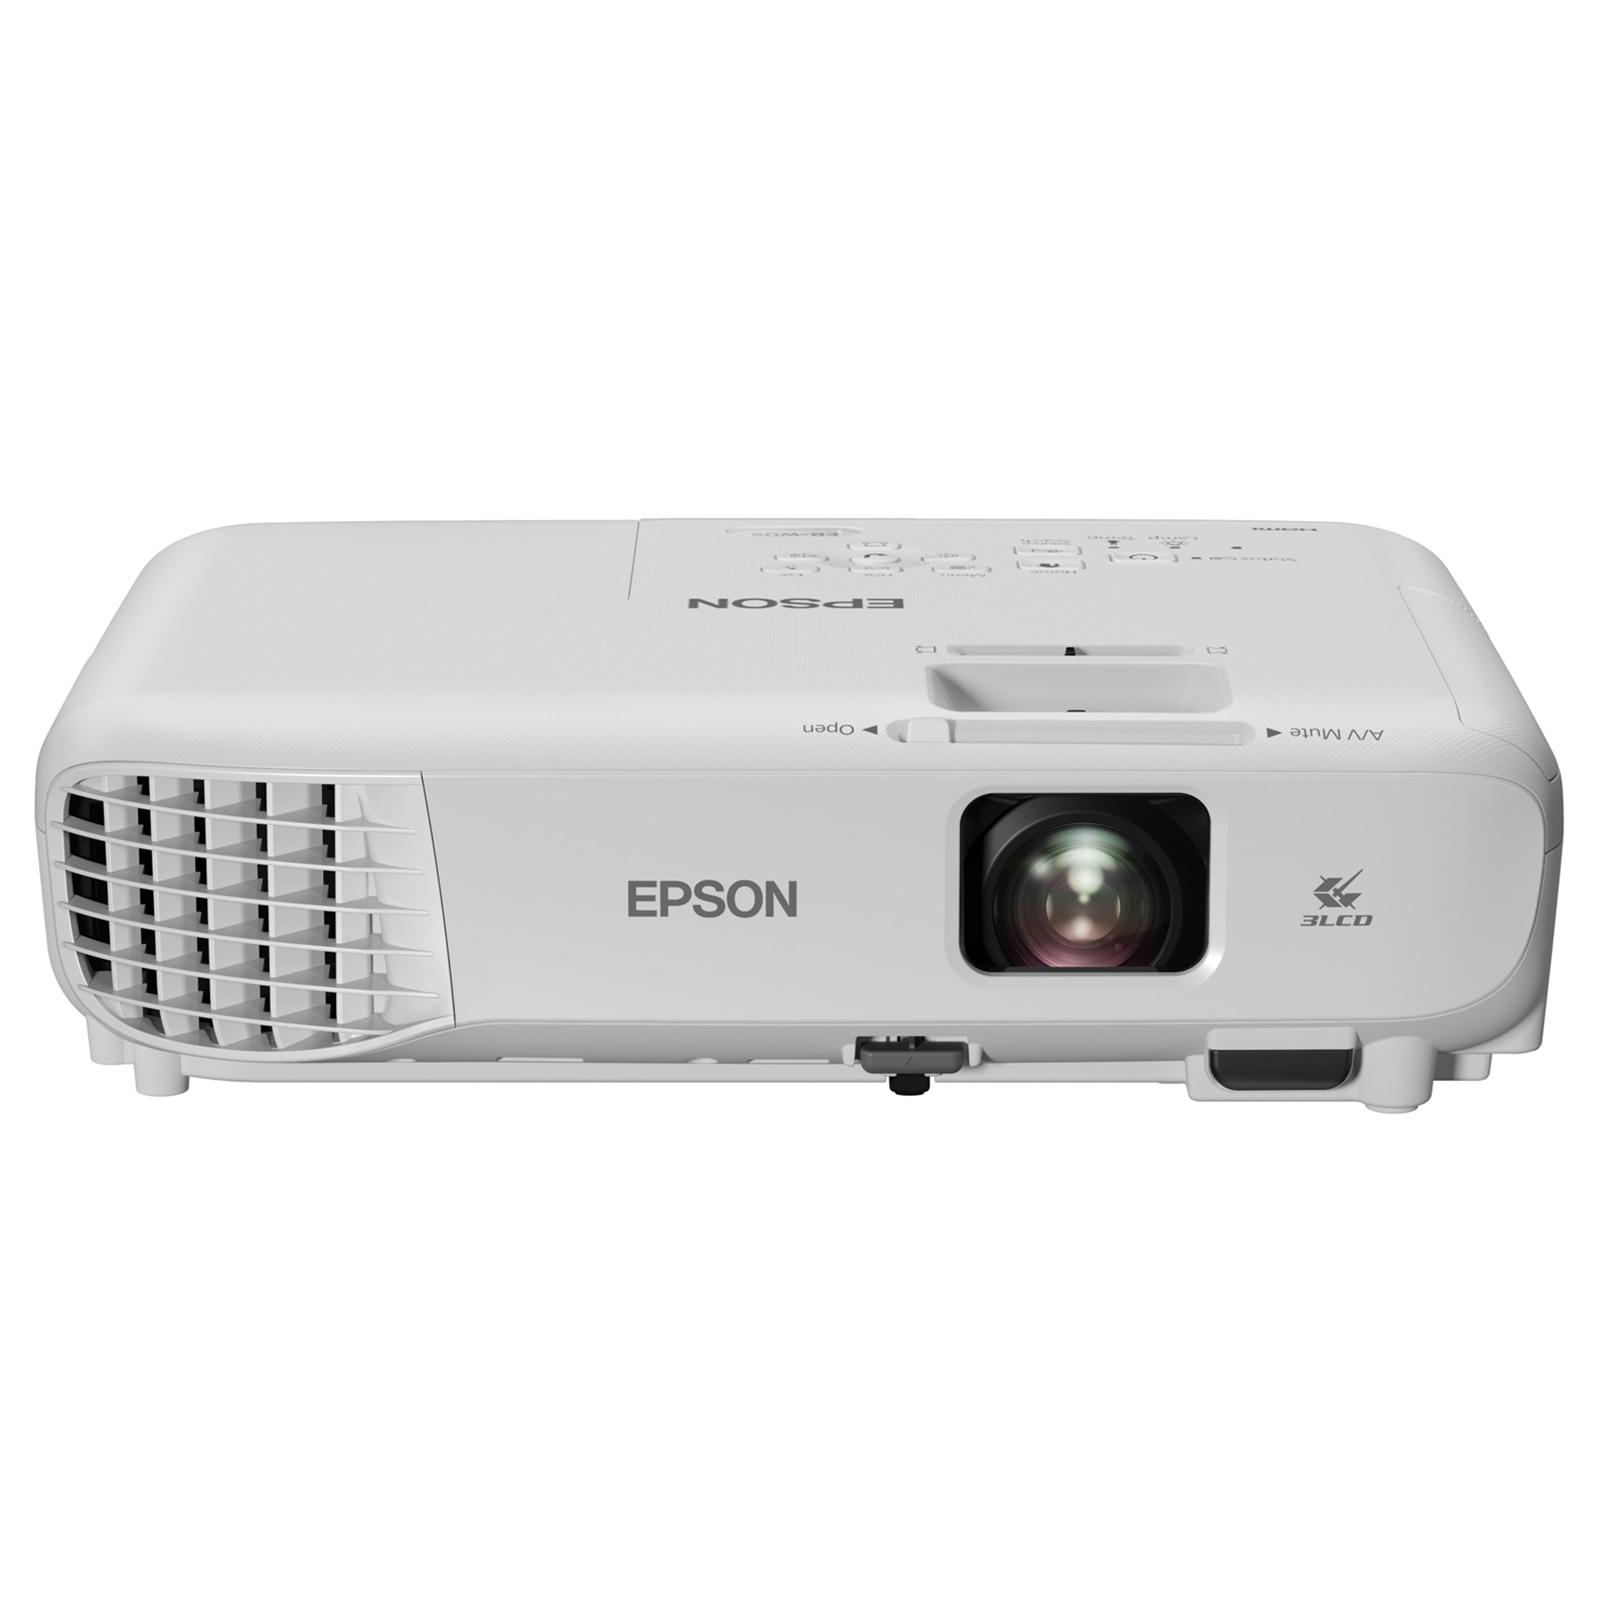 Fotografie Videoproiector Epson EB-W05 ,WXGA, 3300 lumeni, Alb